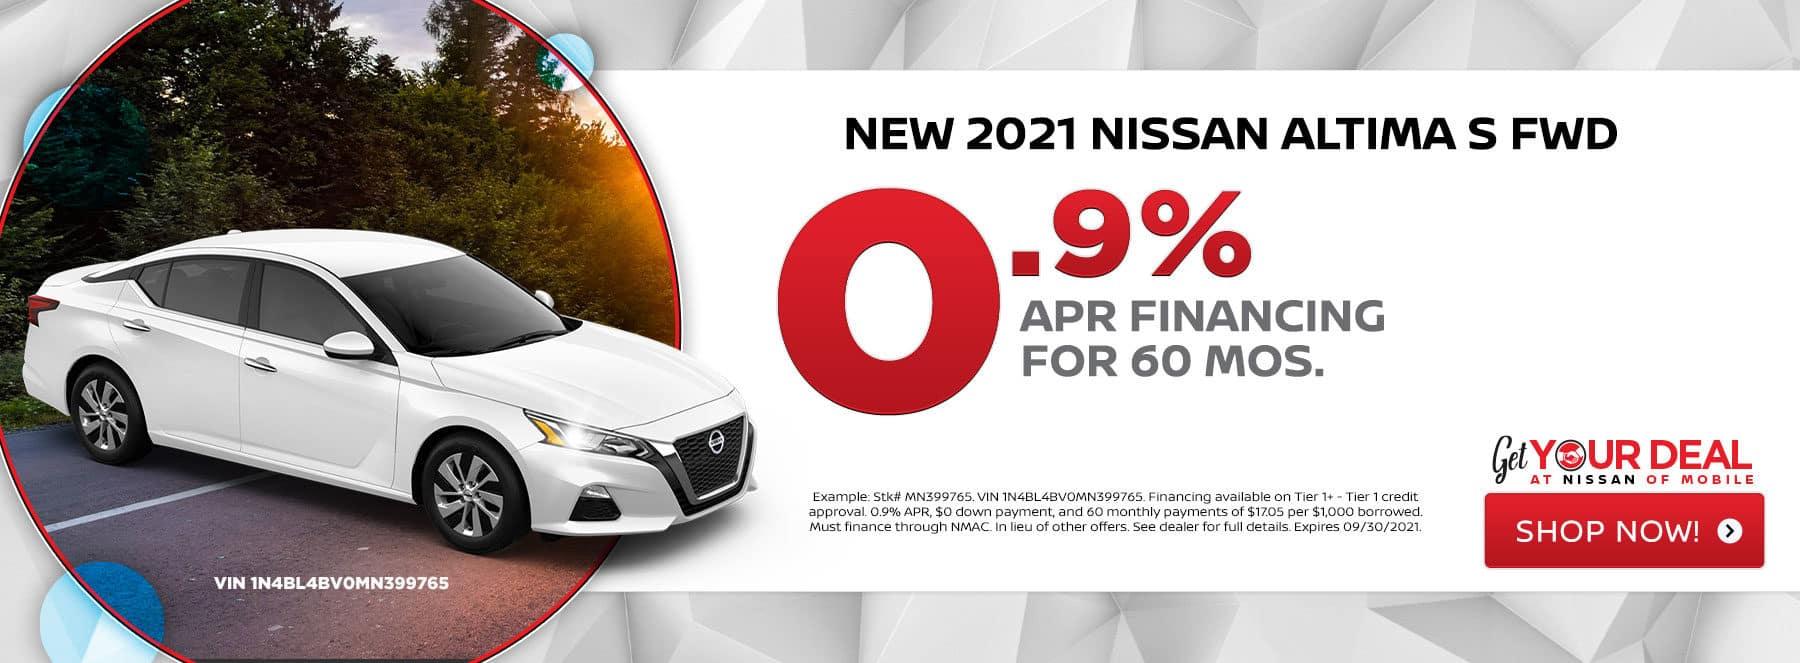 NissanMobile_1800x663_Altima_0APR_0921